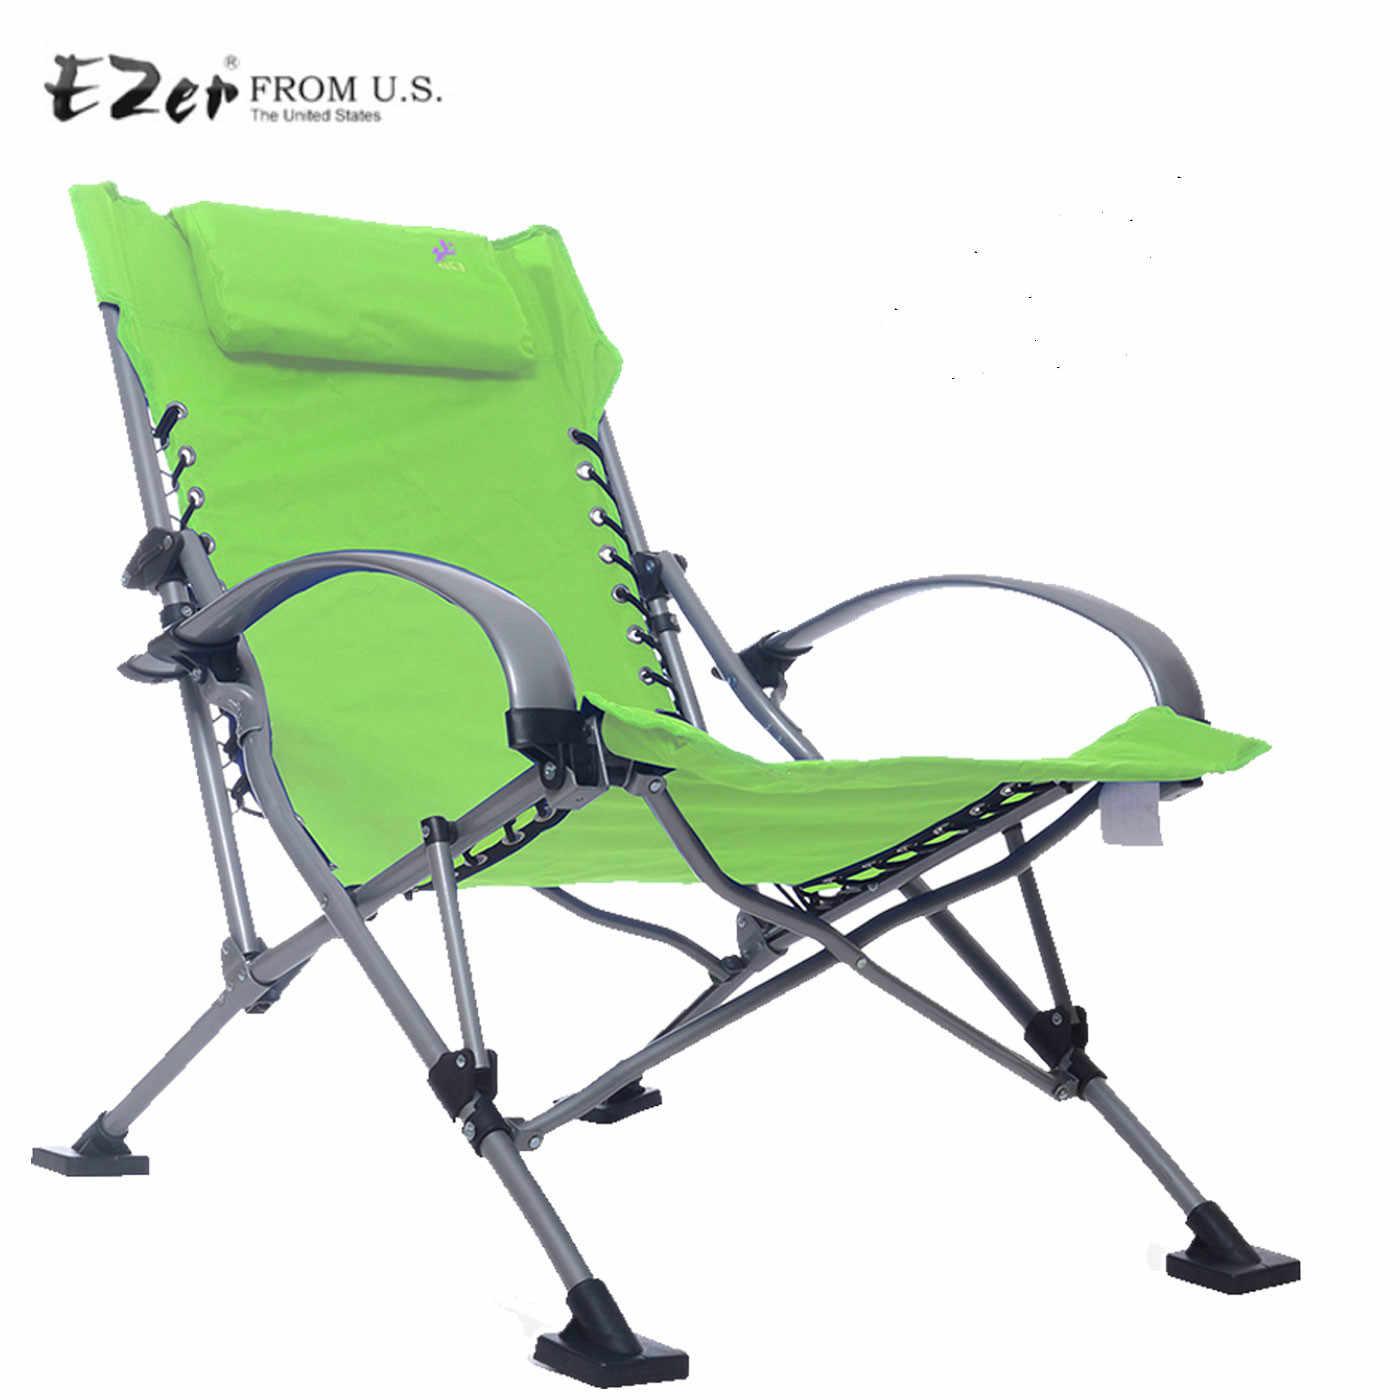 Aluminum Lightweight Folding Beach Chair Fishing Seat Paddle